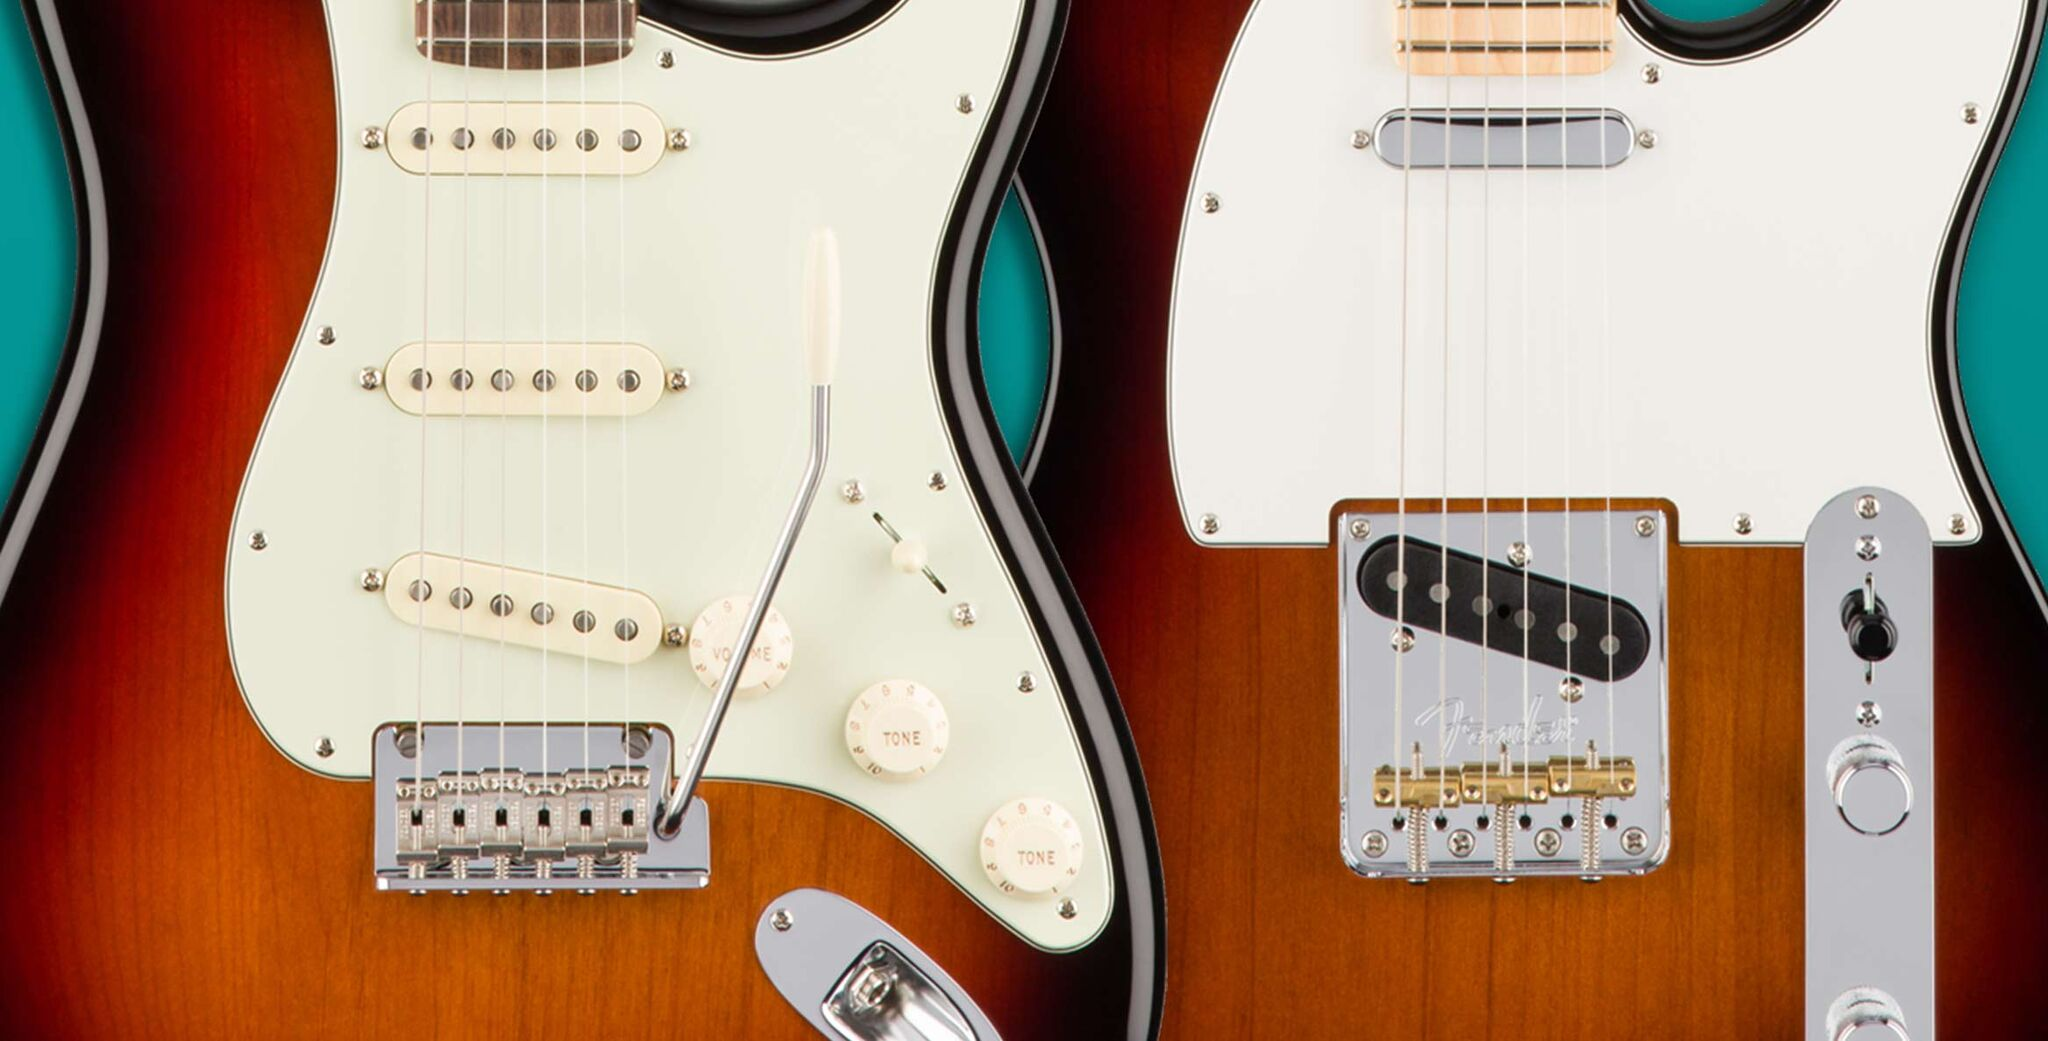 Fender Stratocaster Vs Telecaster Difference In Tone Sound Body